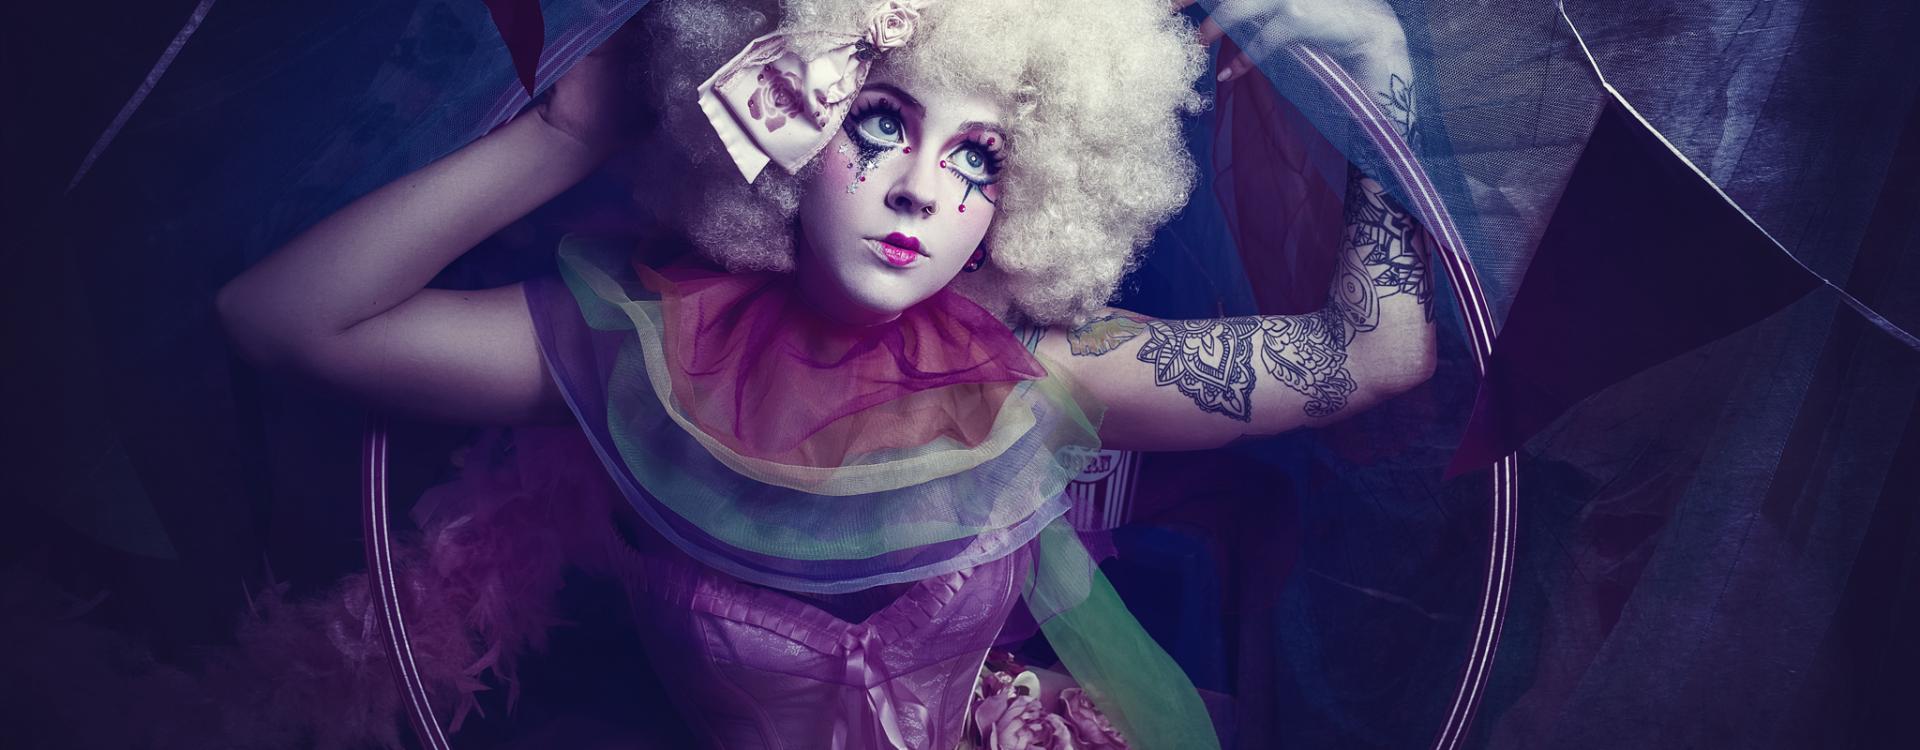 Doll Circus